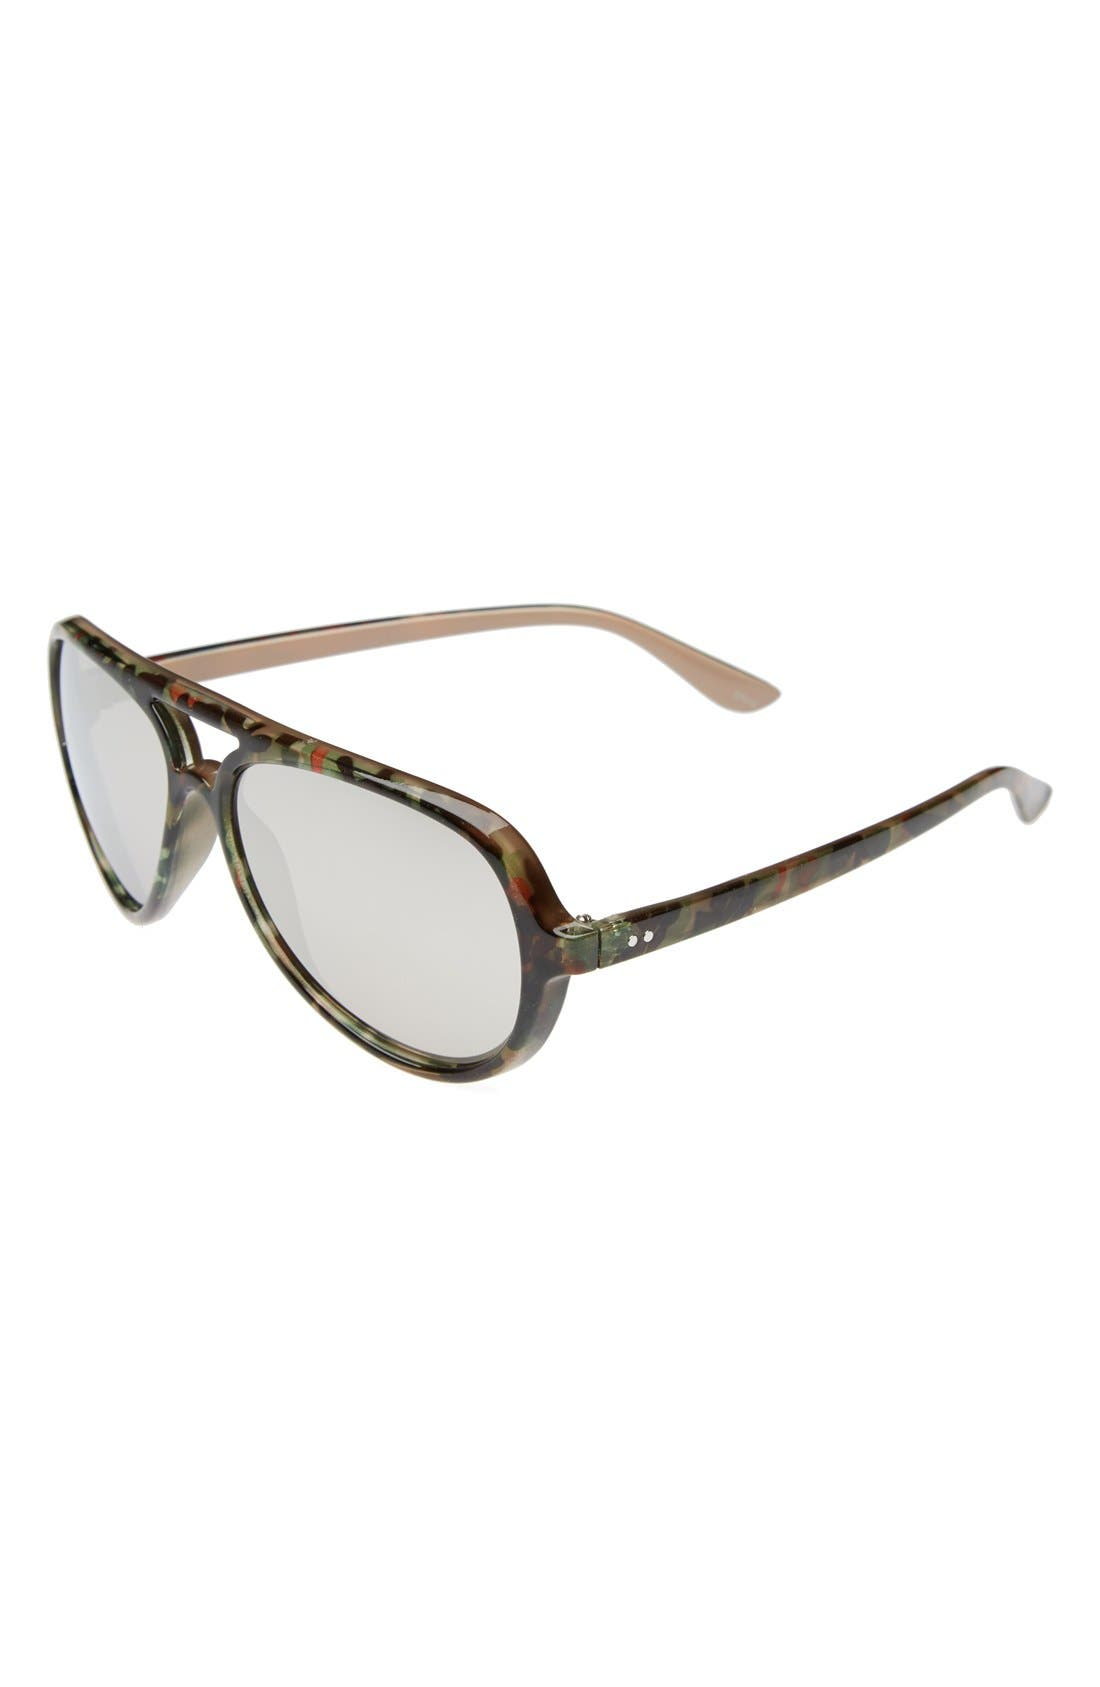 Alternate Image 1 Selected - Icon Eyewear 'Matt' Camo Print Aviator Sunglasses (Big Boys)